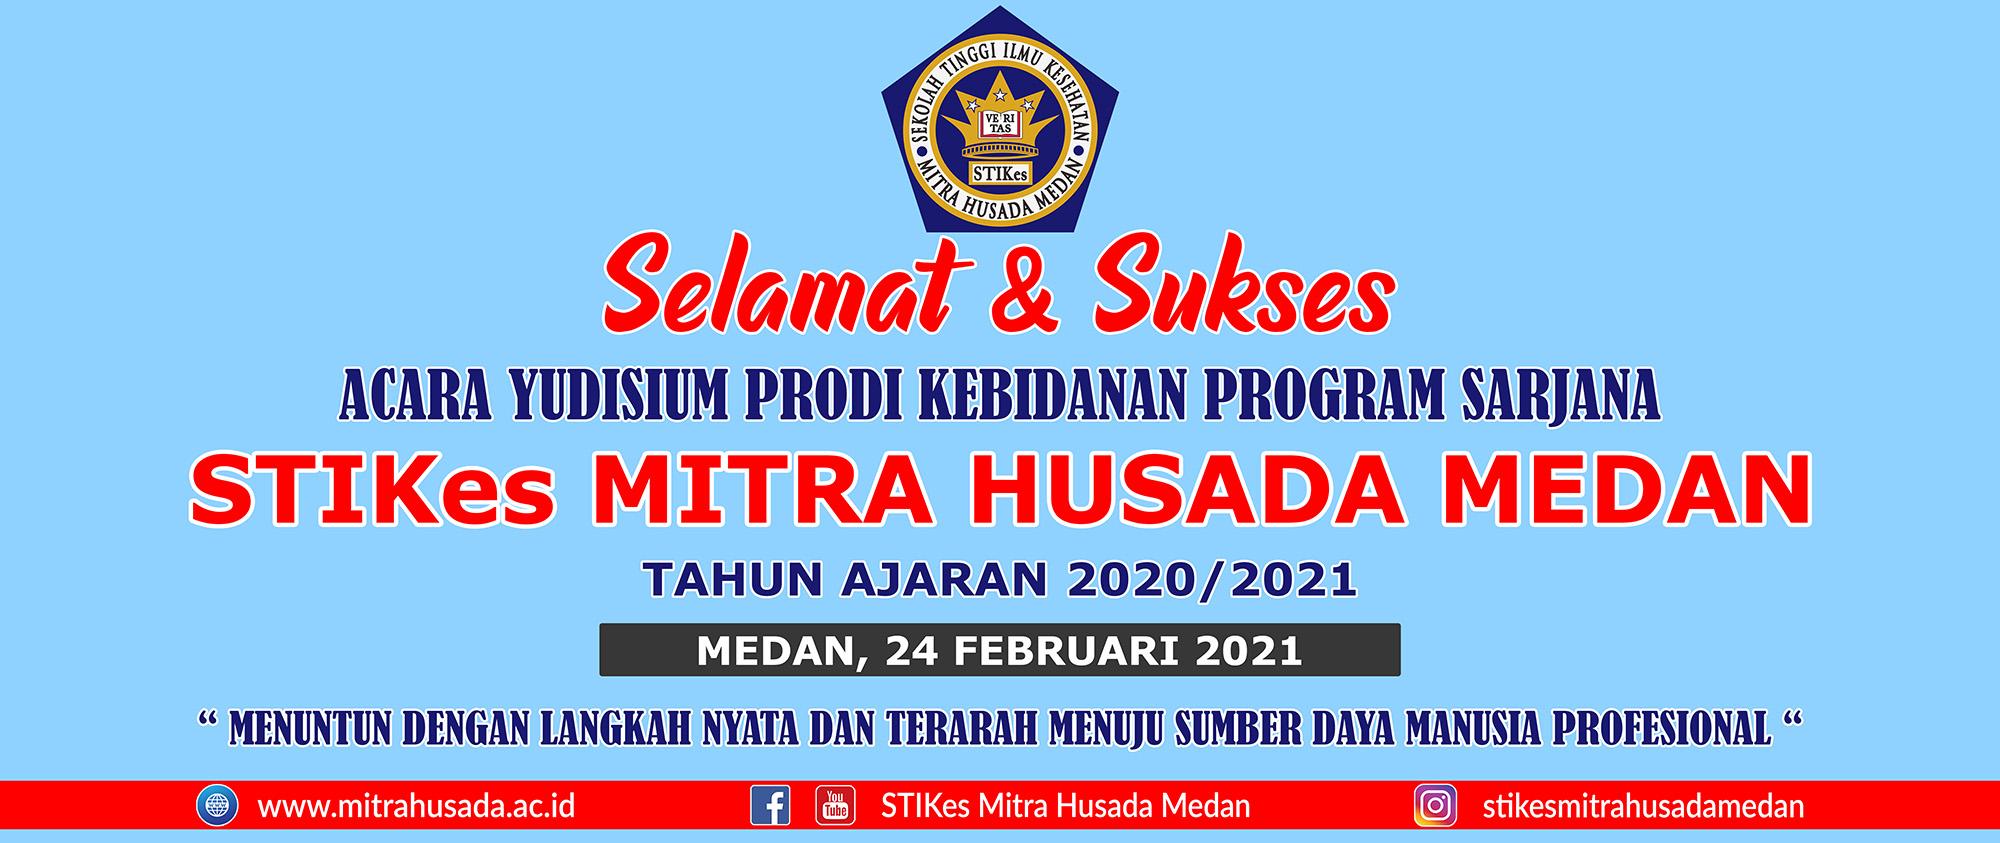 Acara Yudisium Prodi Kebidanan Program Sarjana STIKes Mitra Husada Medan Tahun Ajaran 2020/2021